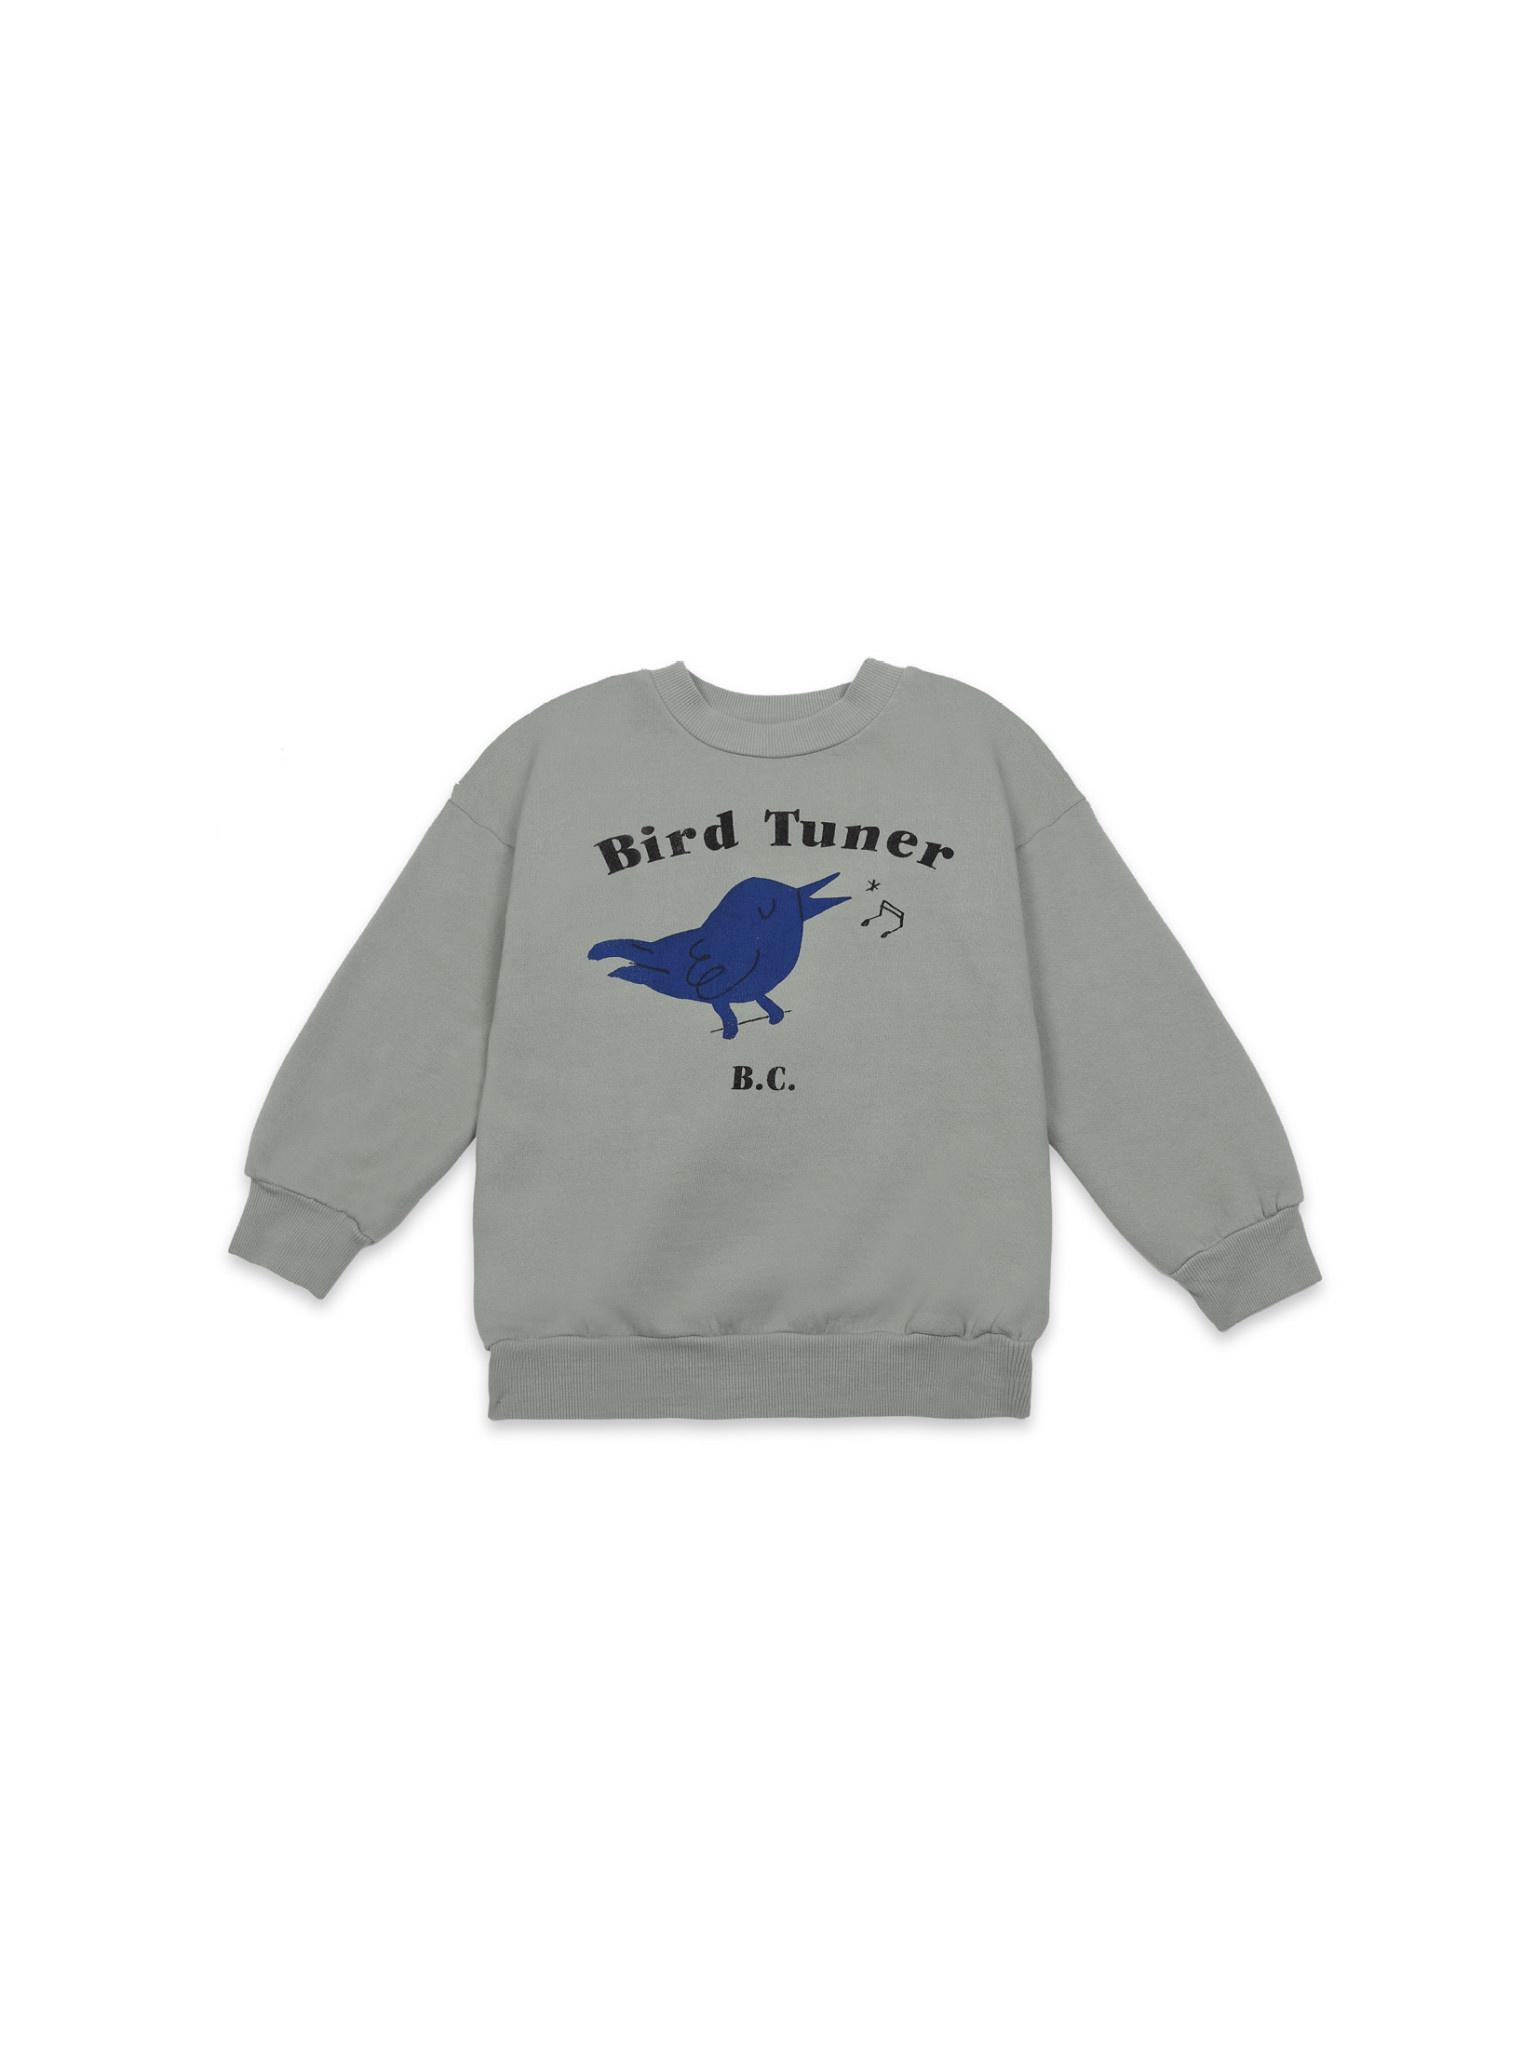 Bird tuner sweatshirt teens-1